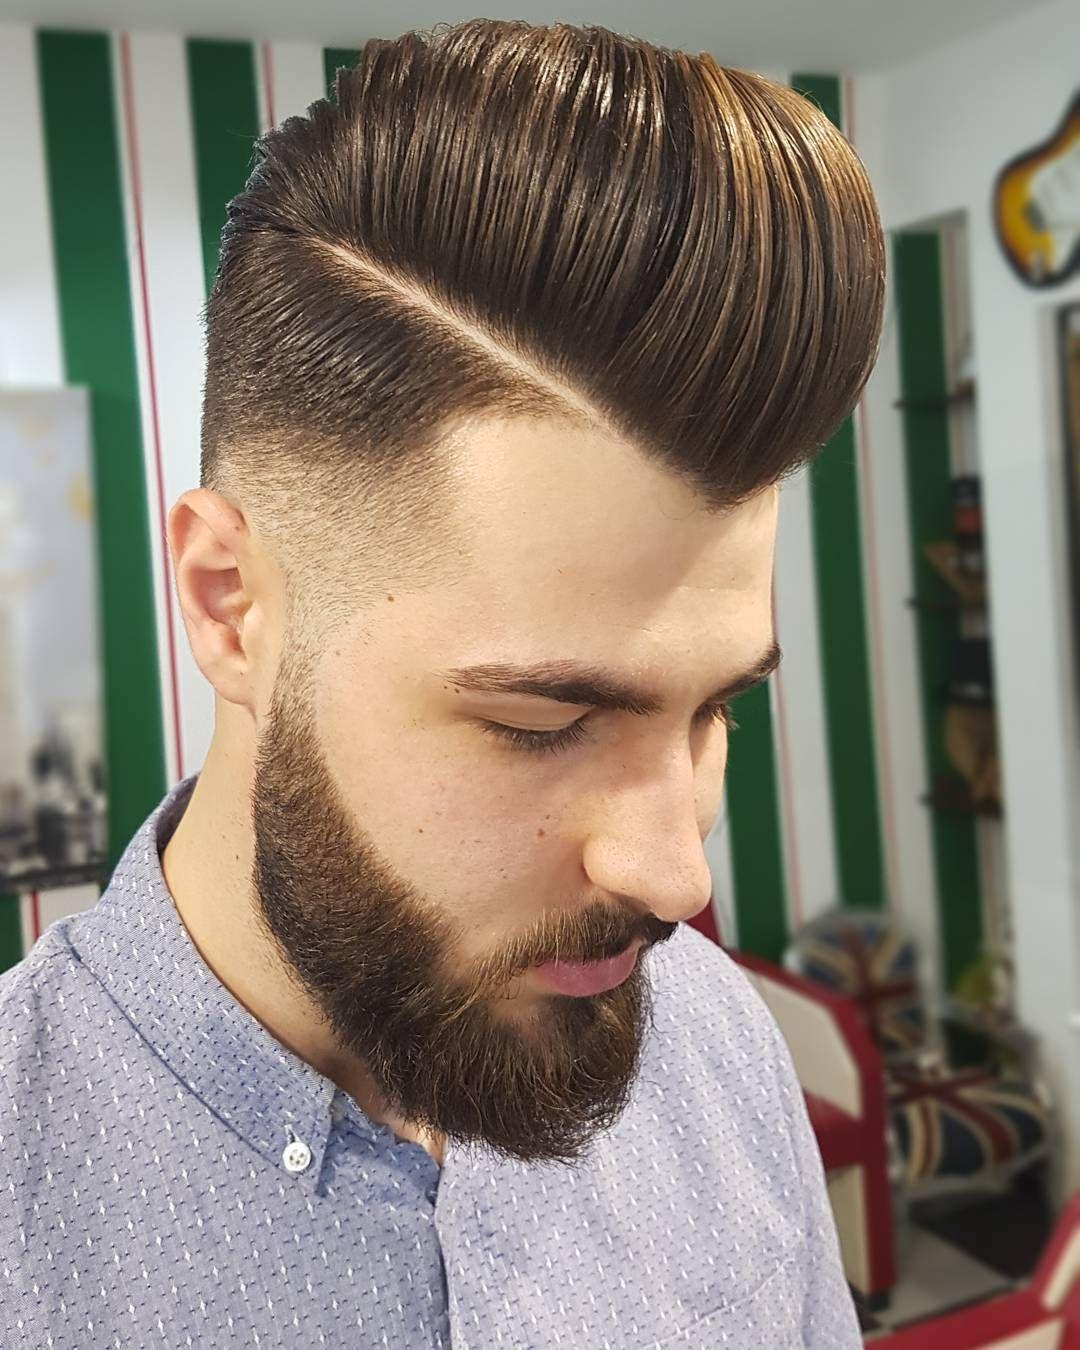 Daniele centorbi hairstylist danythebarber u instagramfotos